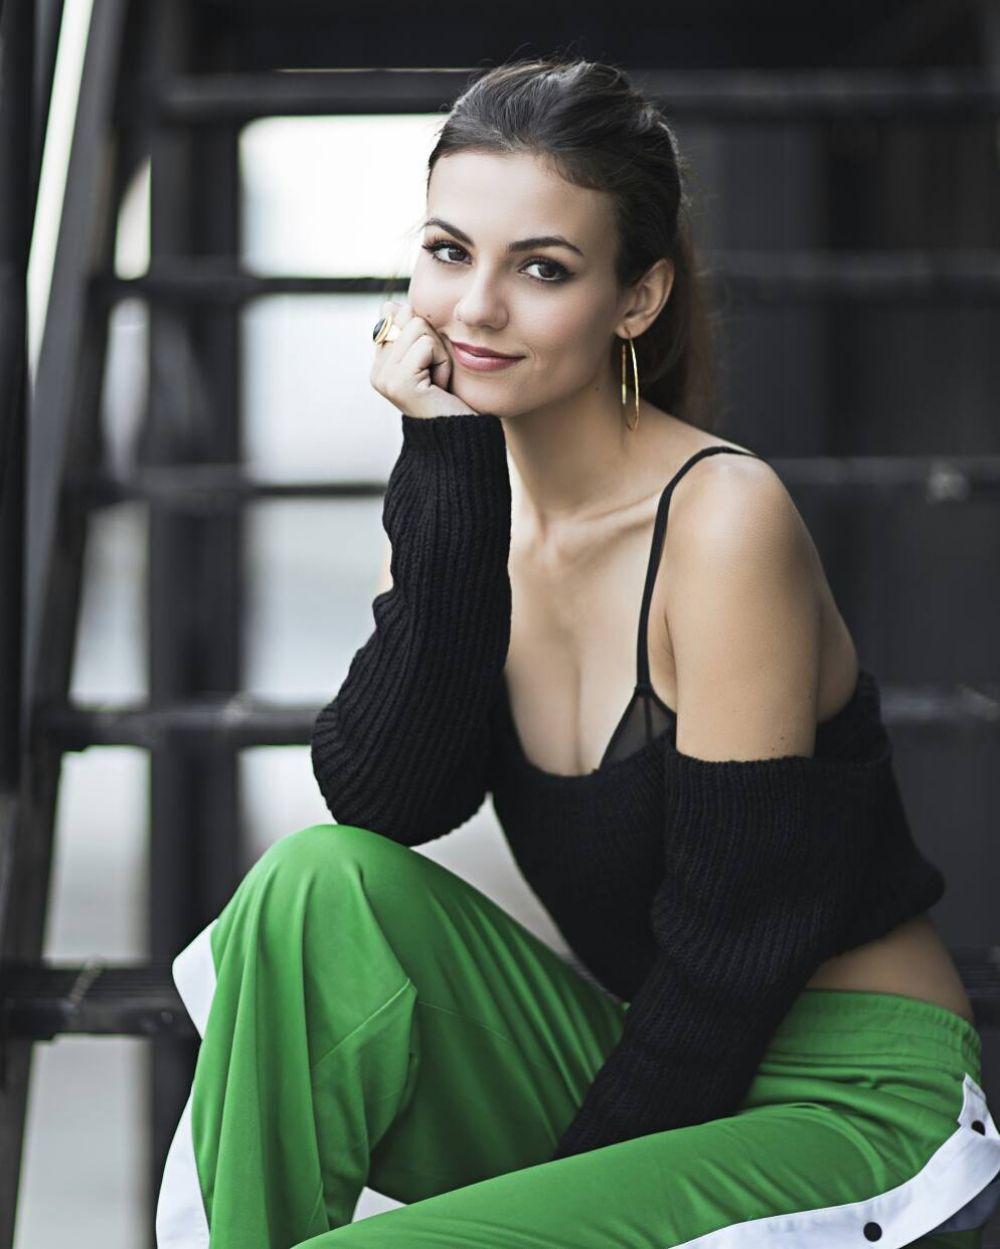 Photoshoot victoria justice Actress Victoria